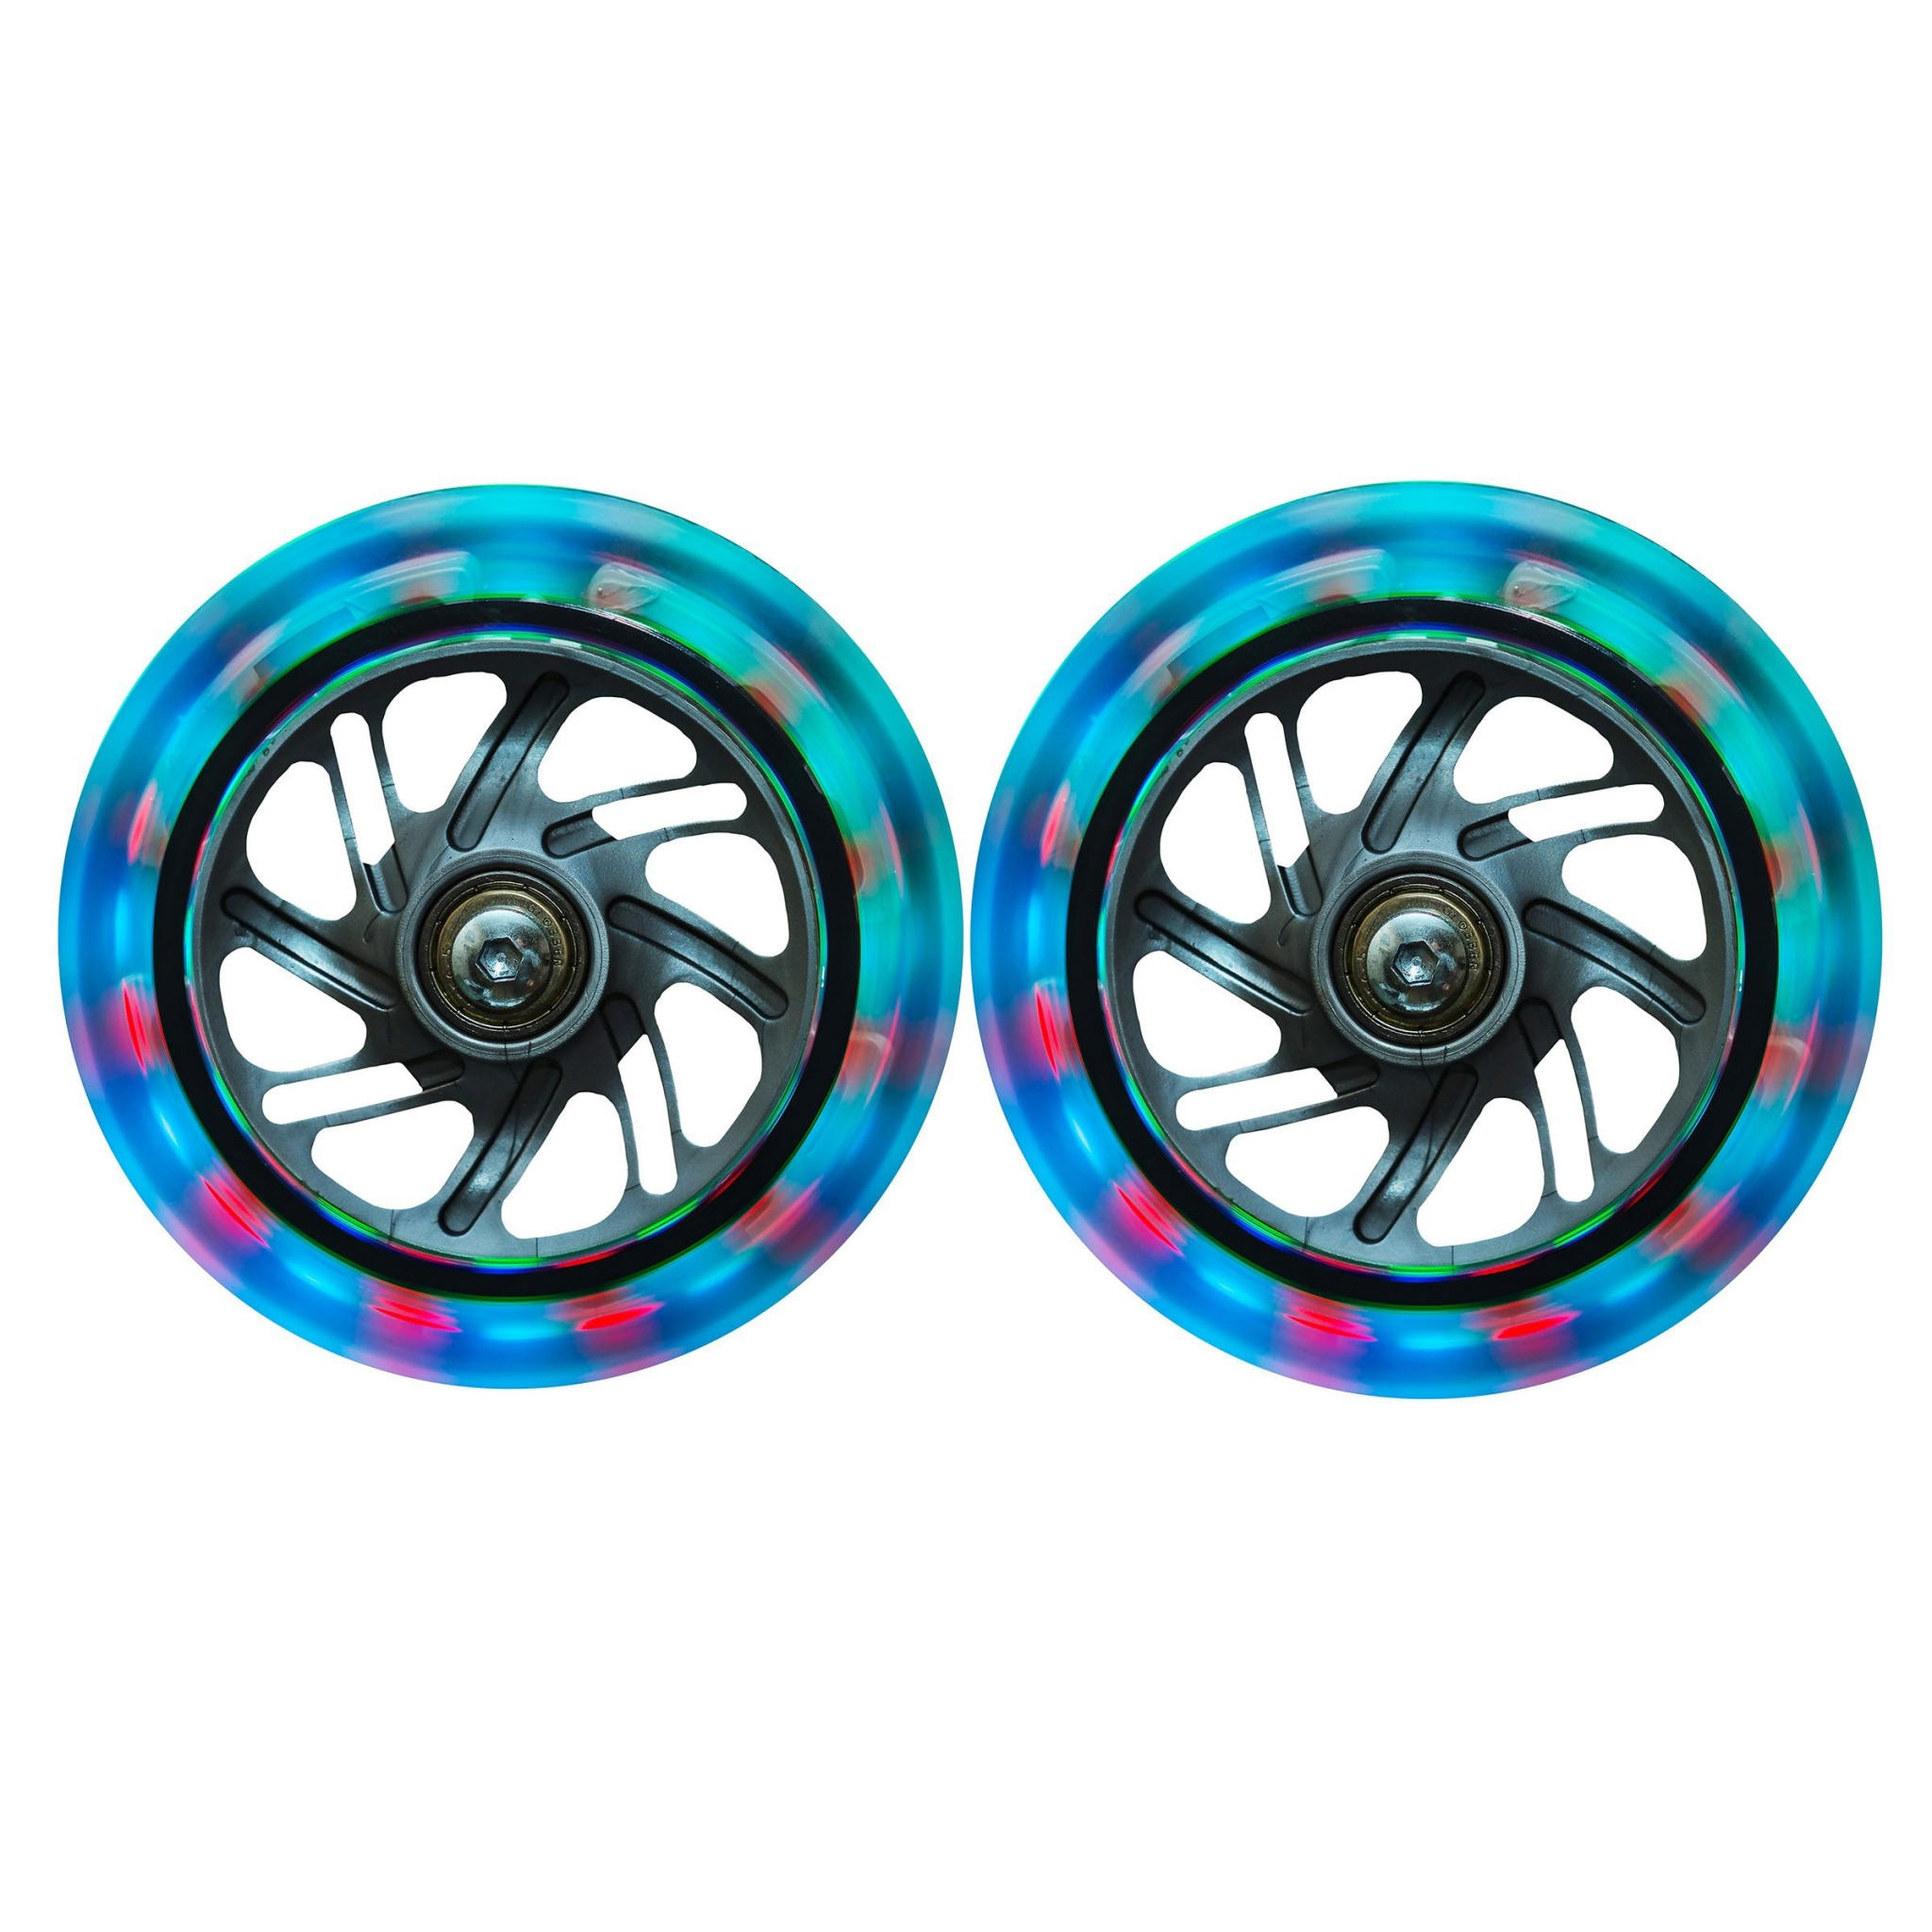 light up scooter wheels - Globber 0